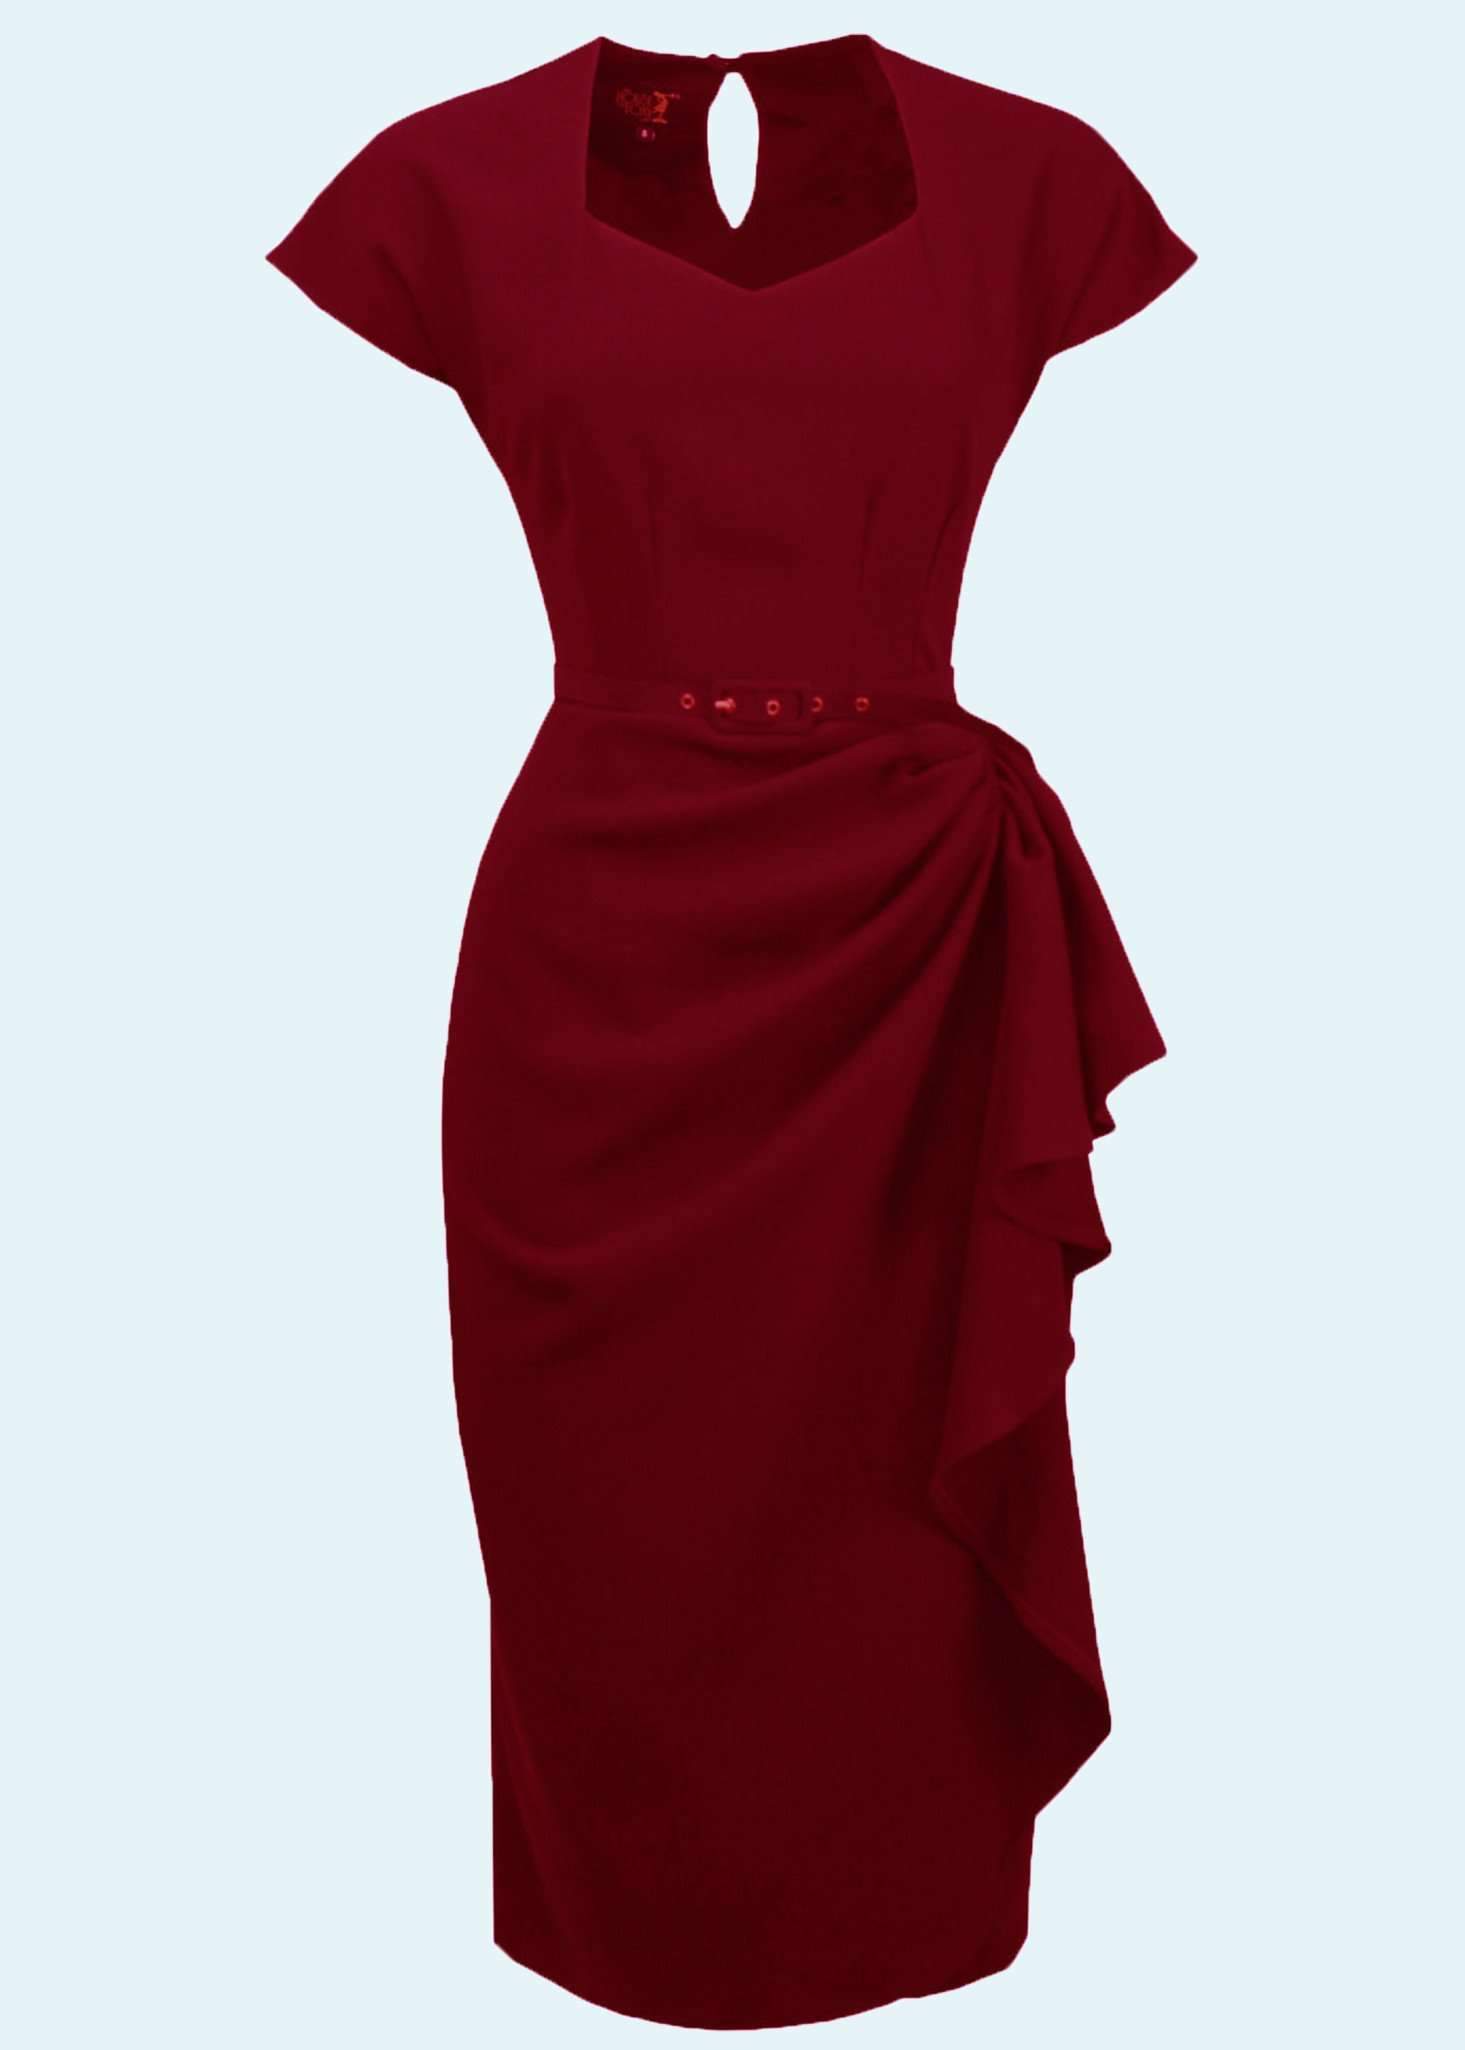 Hayworth pencil dress in vintage style